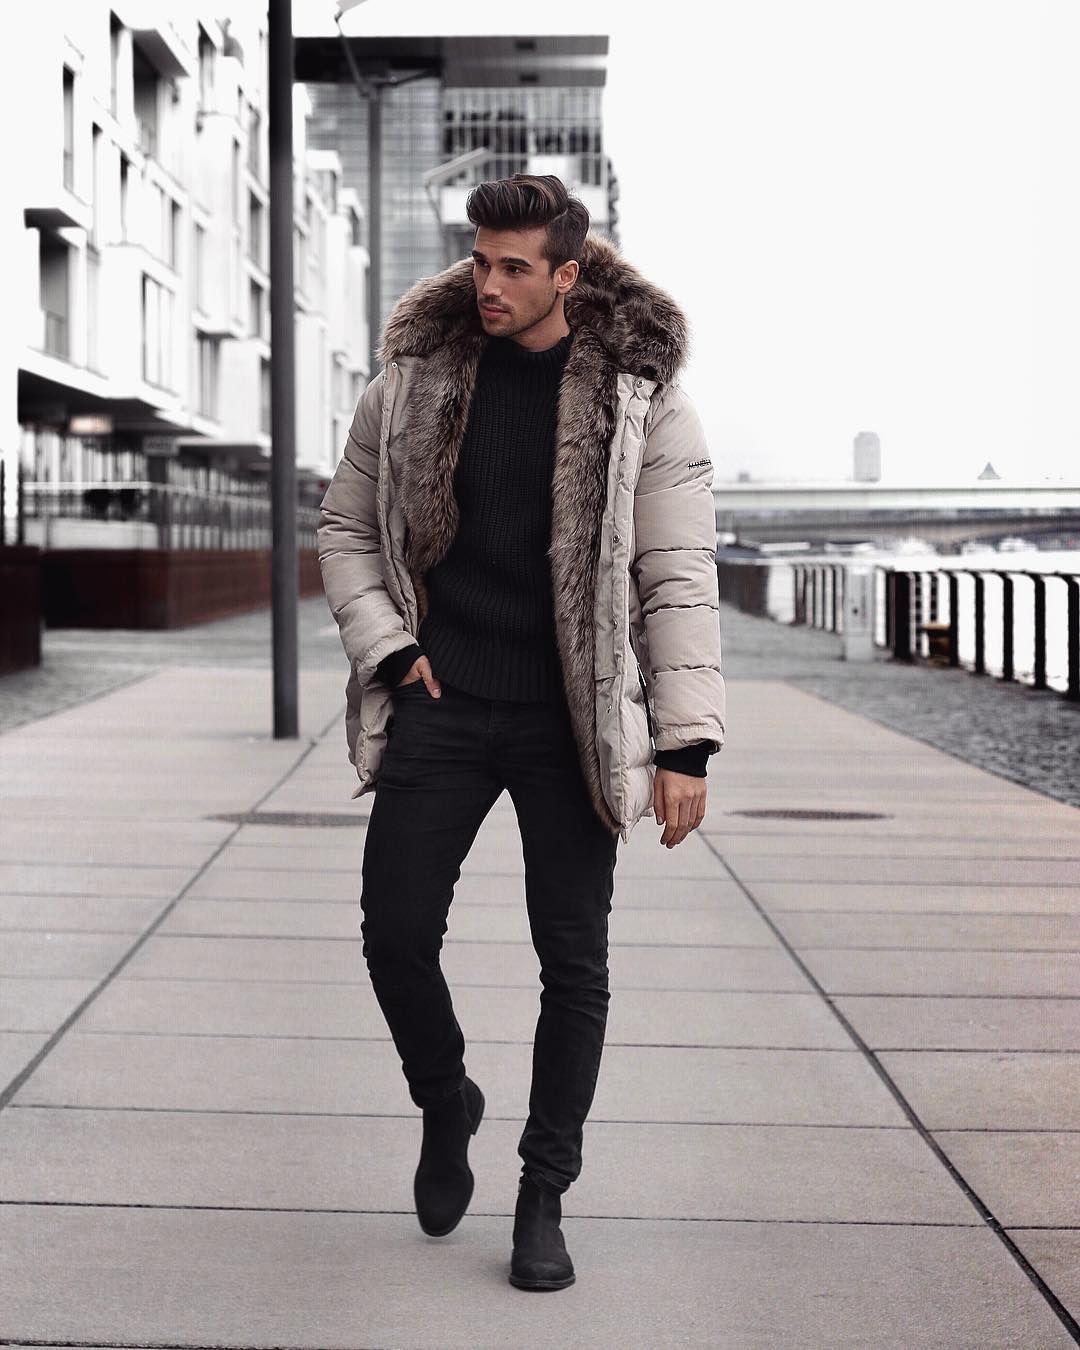 Men S Winter Fashion Puffer Jacket Fur Hooded Black T Shirt Black Jeans Visit Urbanmenoutf Winter Outfits Men Mens Winter Fashion Hipster Mens Fashion